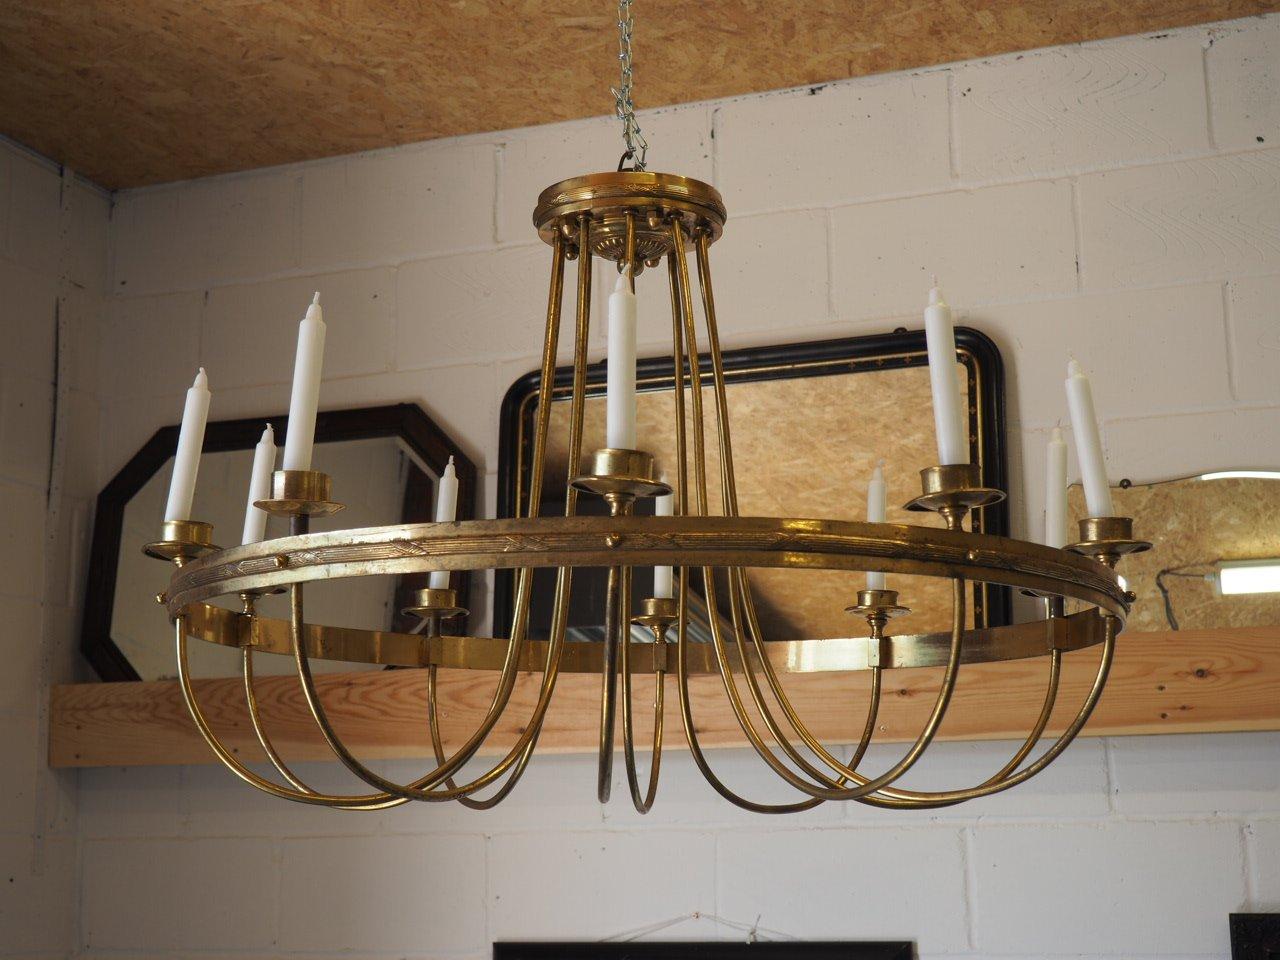 Antiker Kronleuchter aus vergoldetem Messing